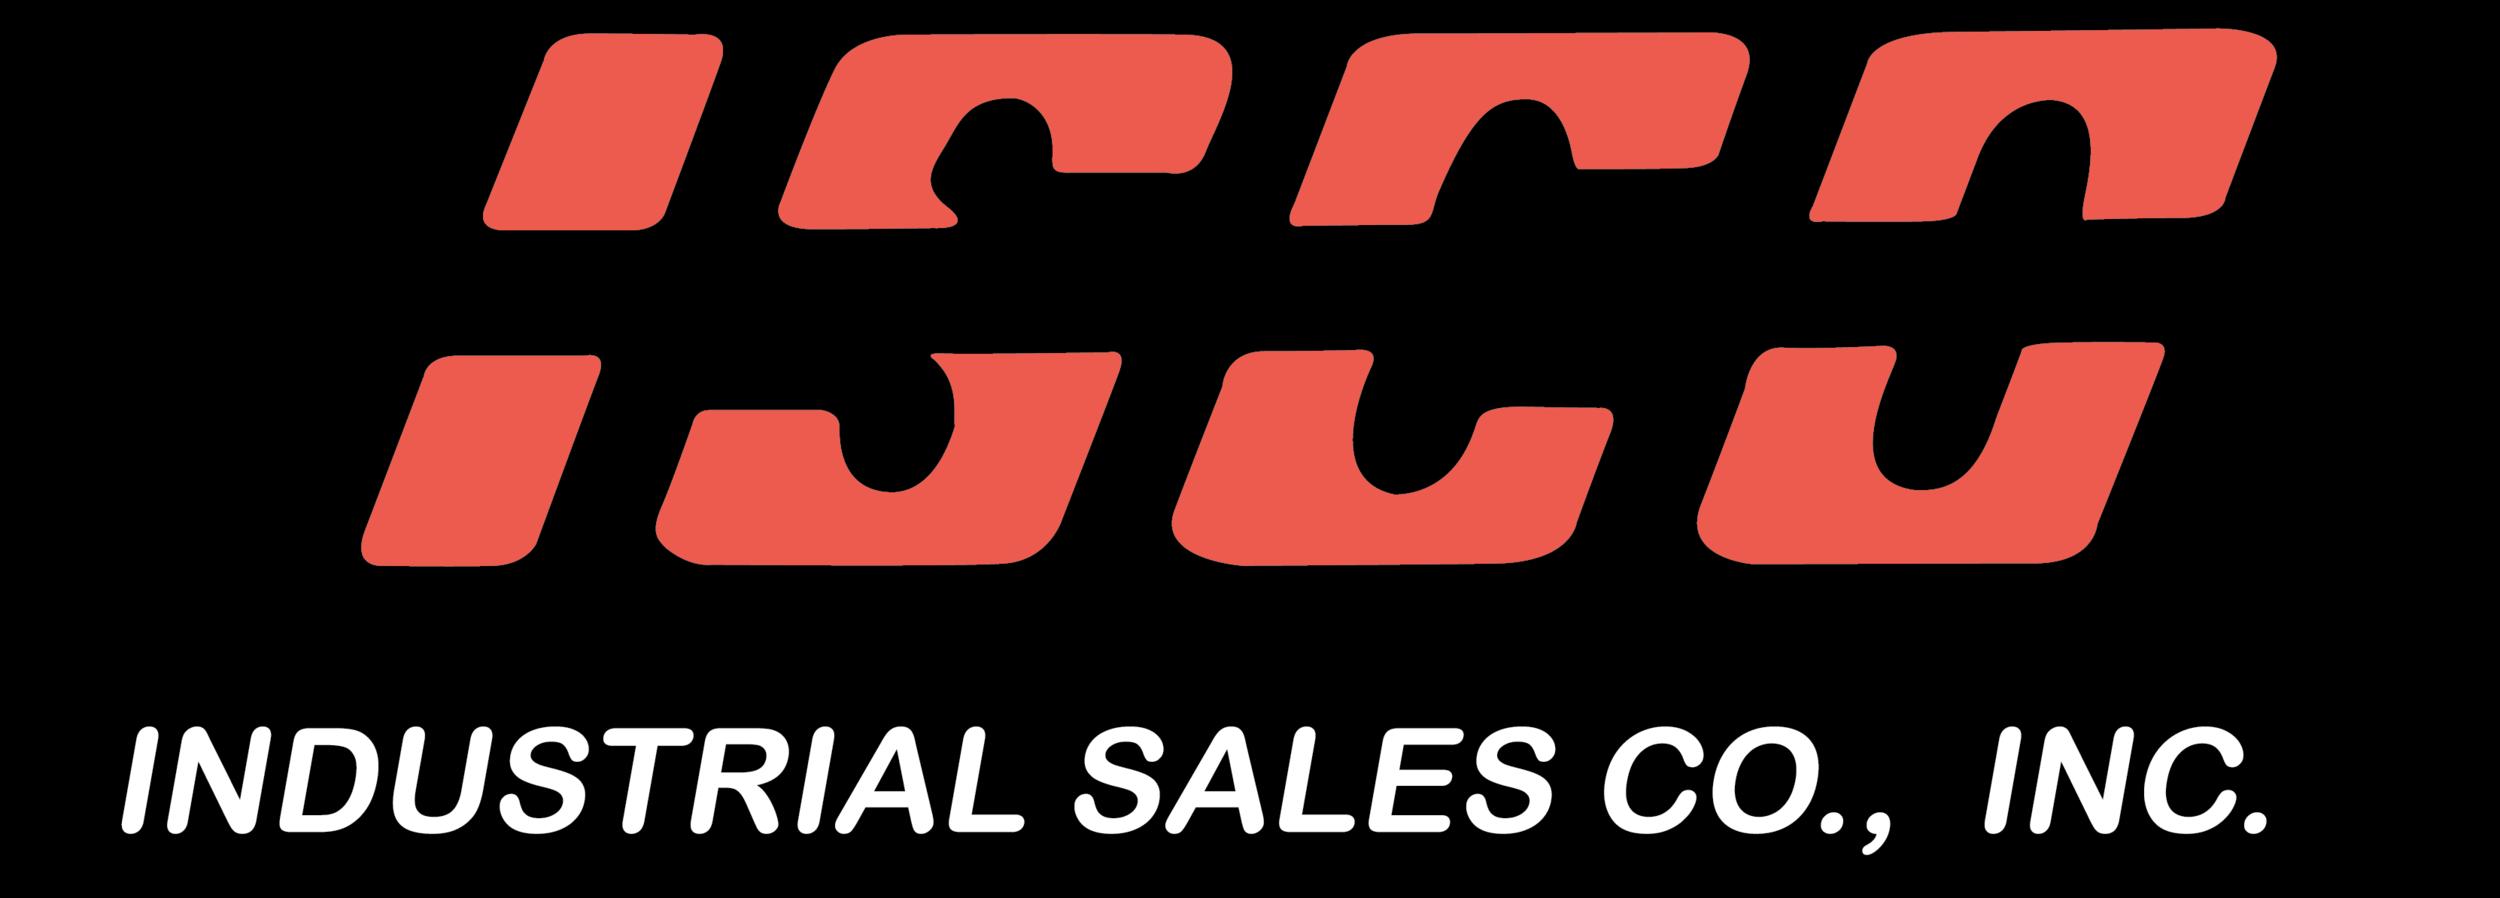 ISCO_Logo.png